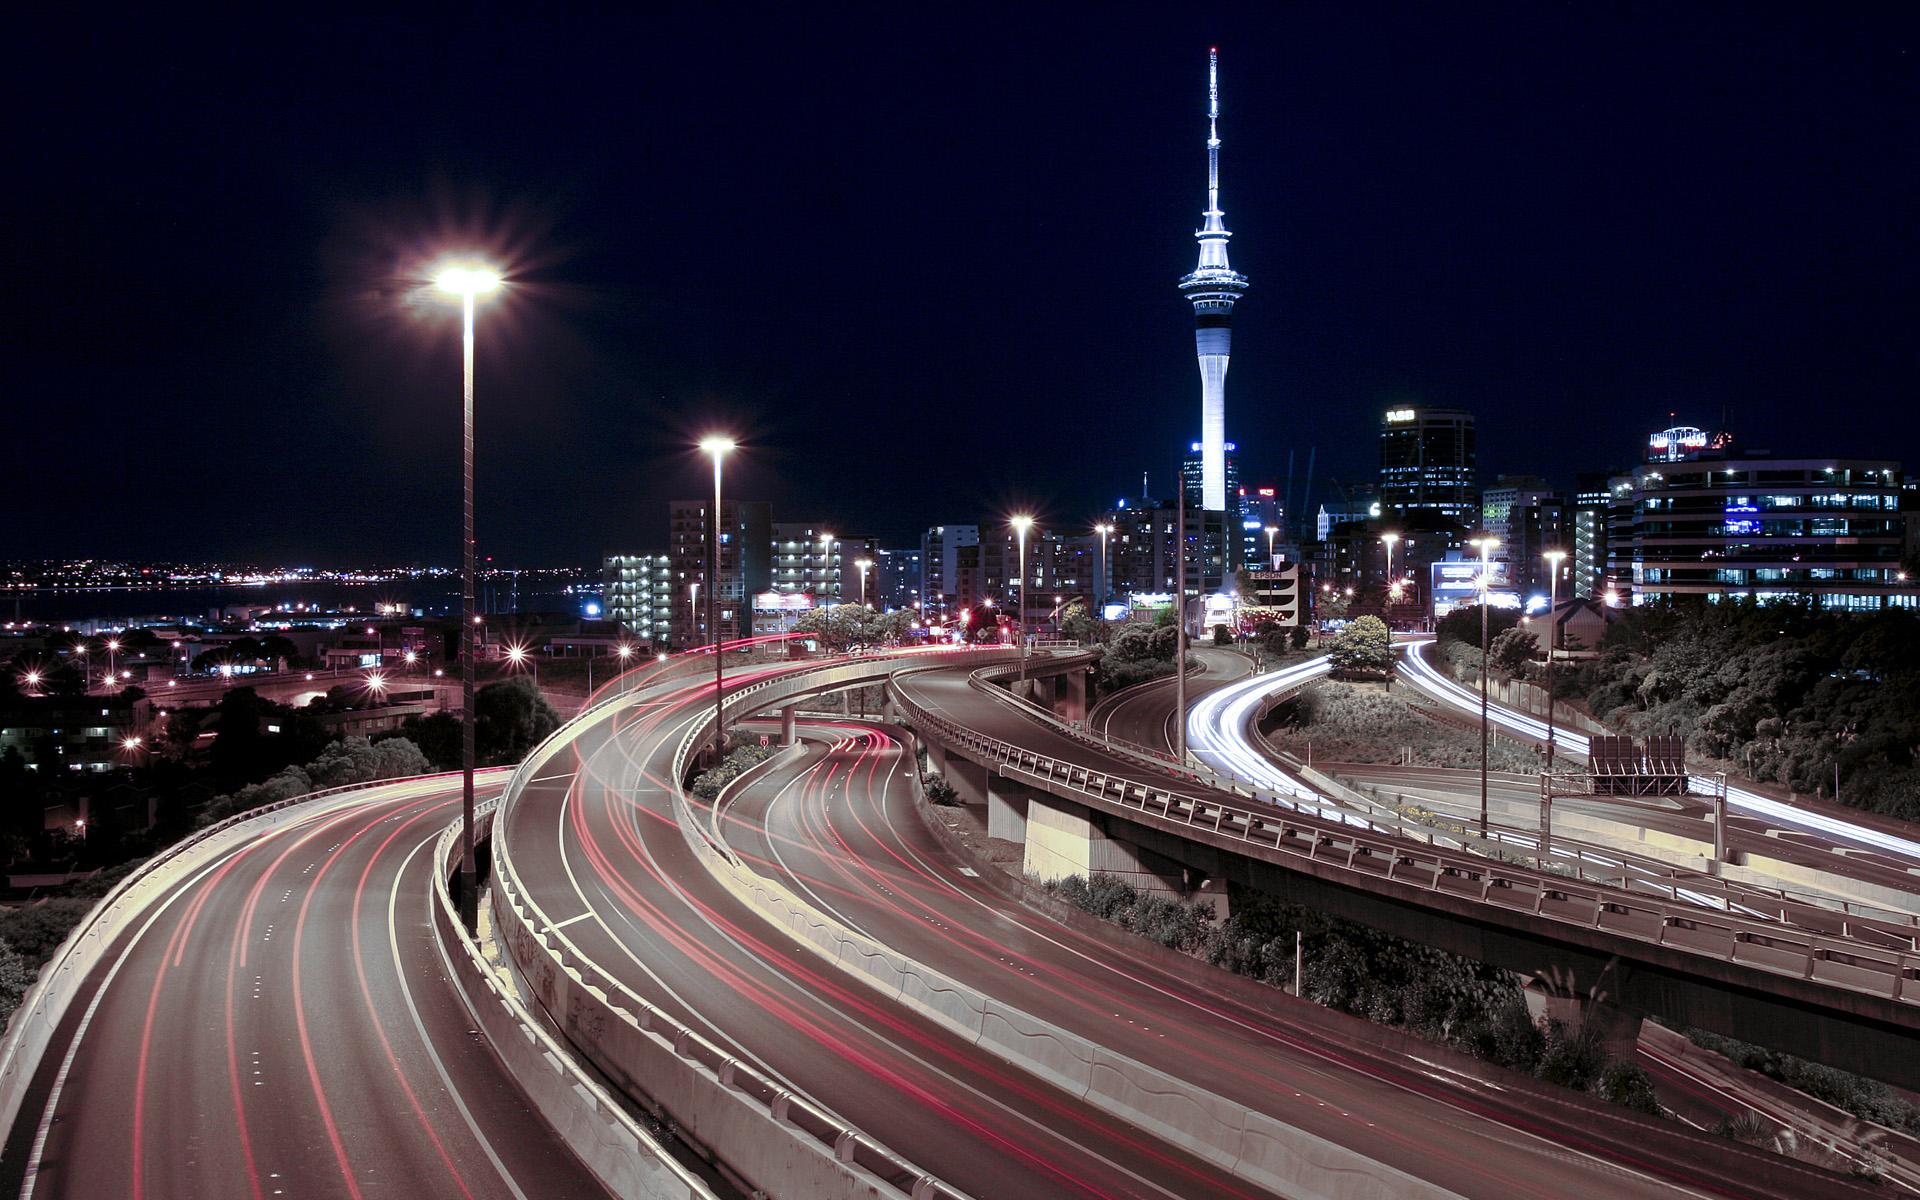 Road: Night, City, Building, Road, Ligths